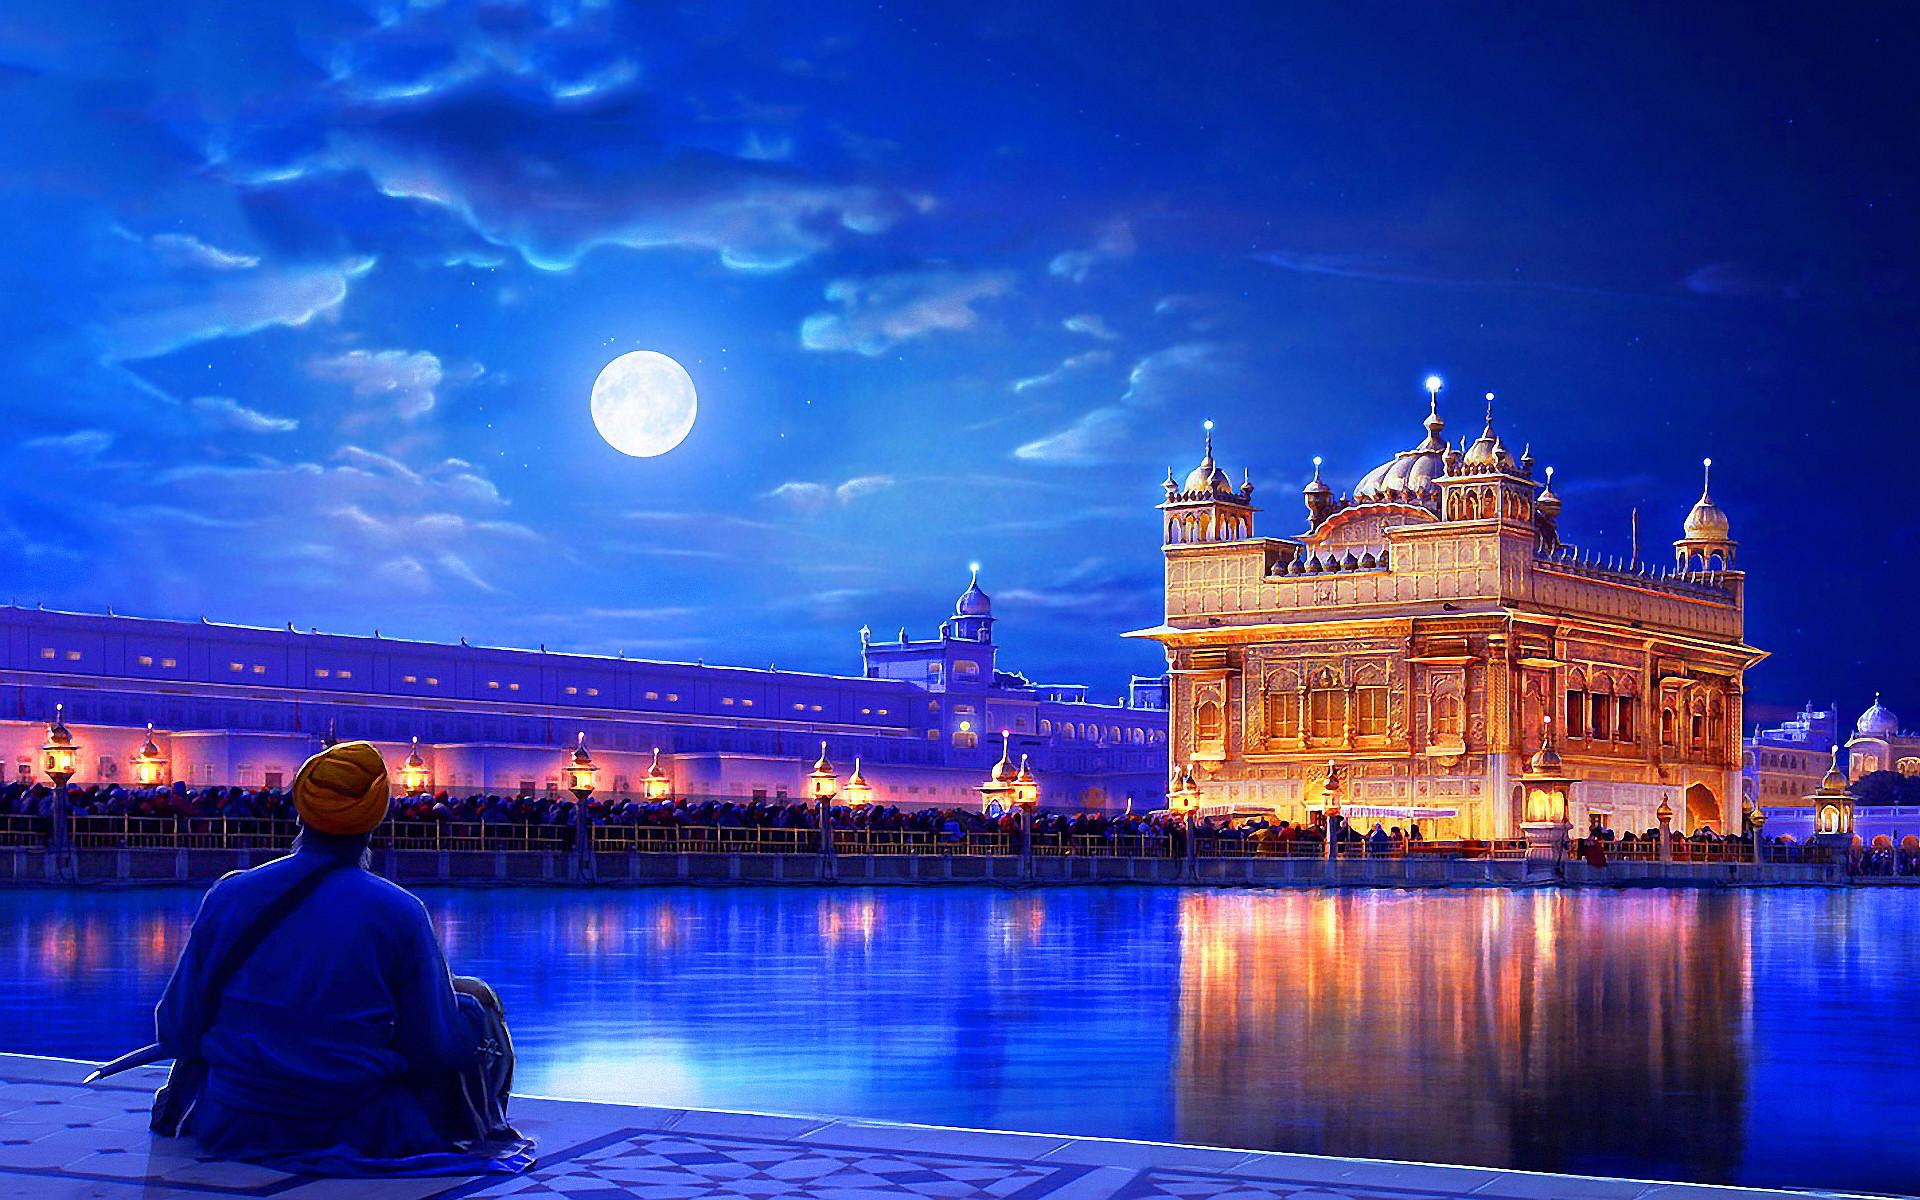 India Background: India Desktop Wallpaper (57+ Images